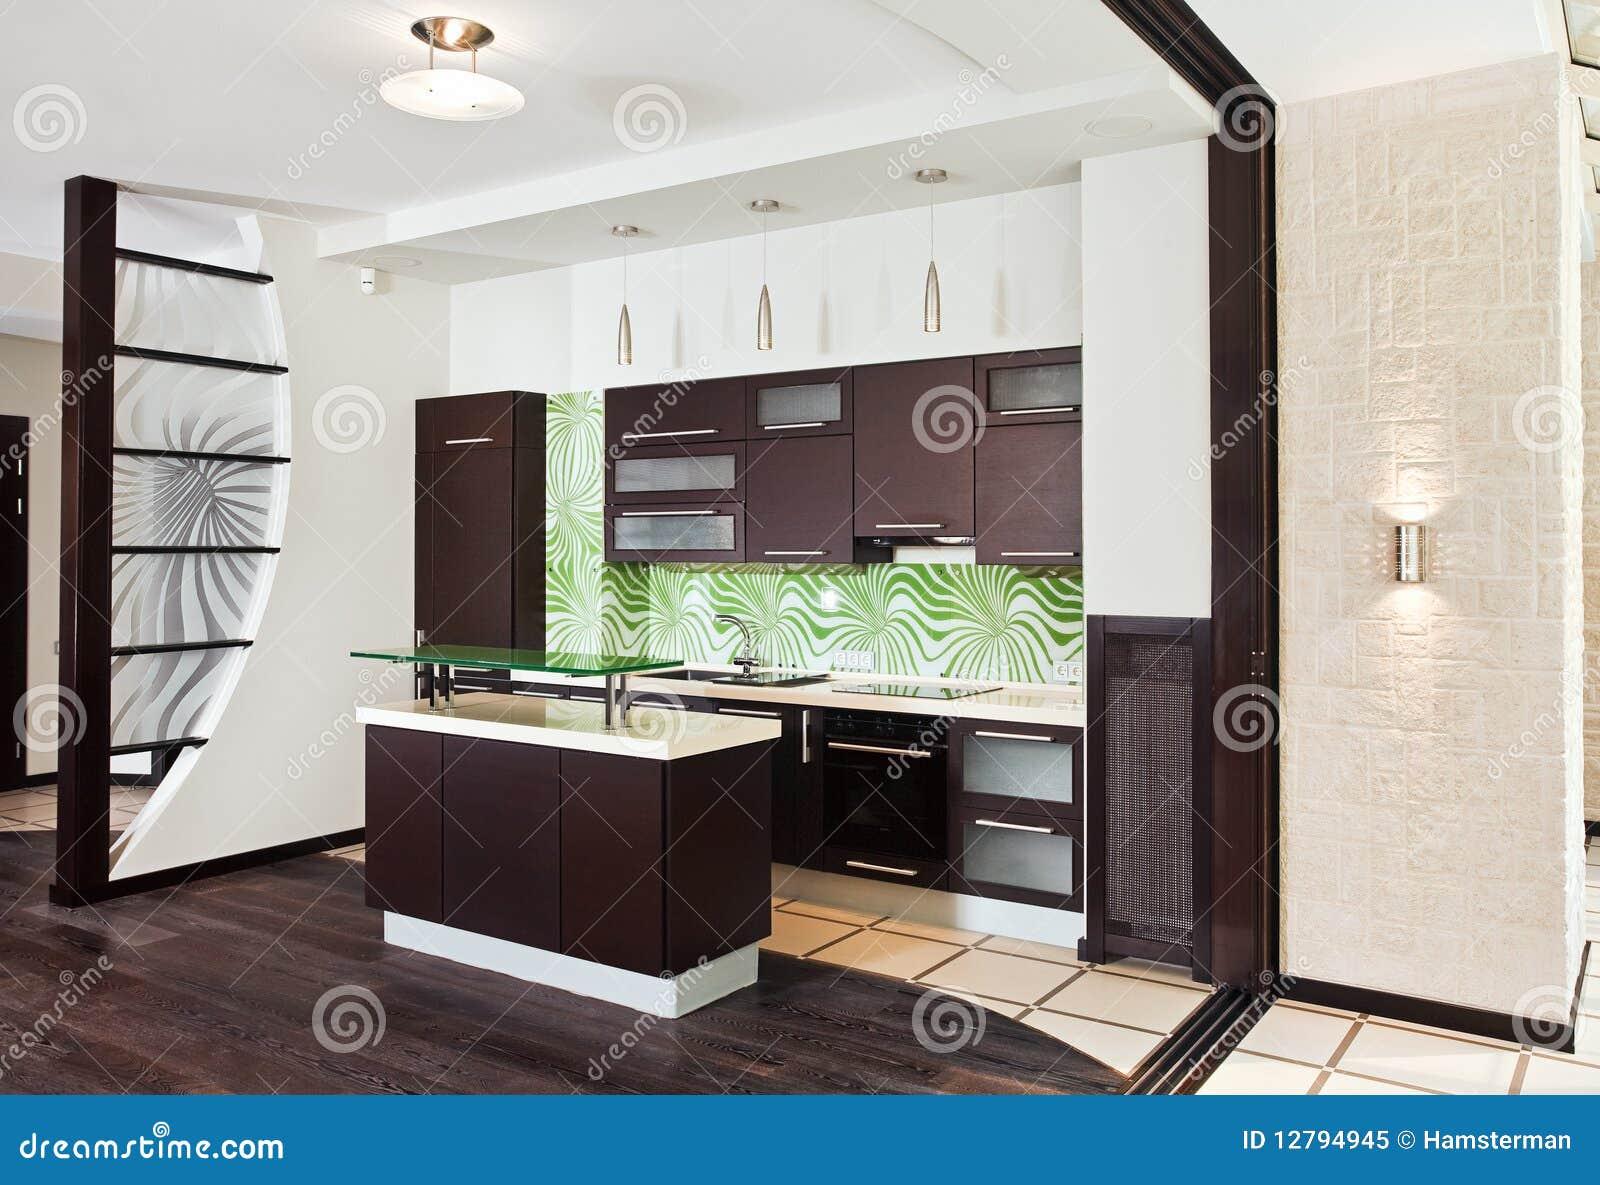 Cocina moderna con el suelo de madera oscuro imagen de - Suelo madera cocina ...